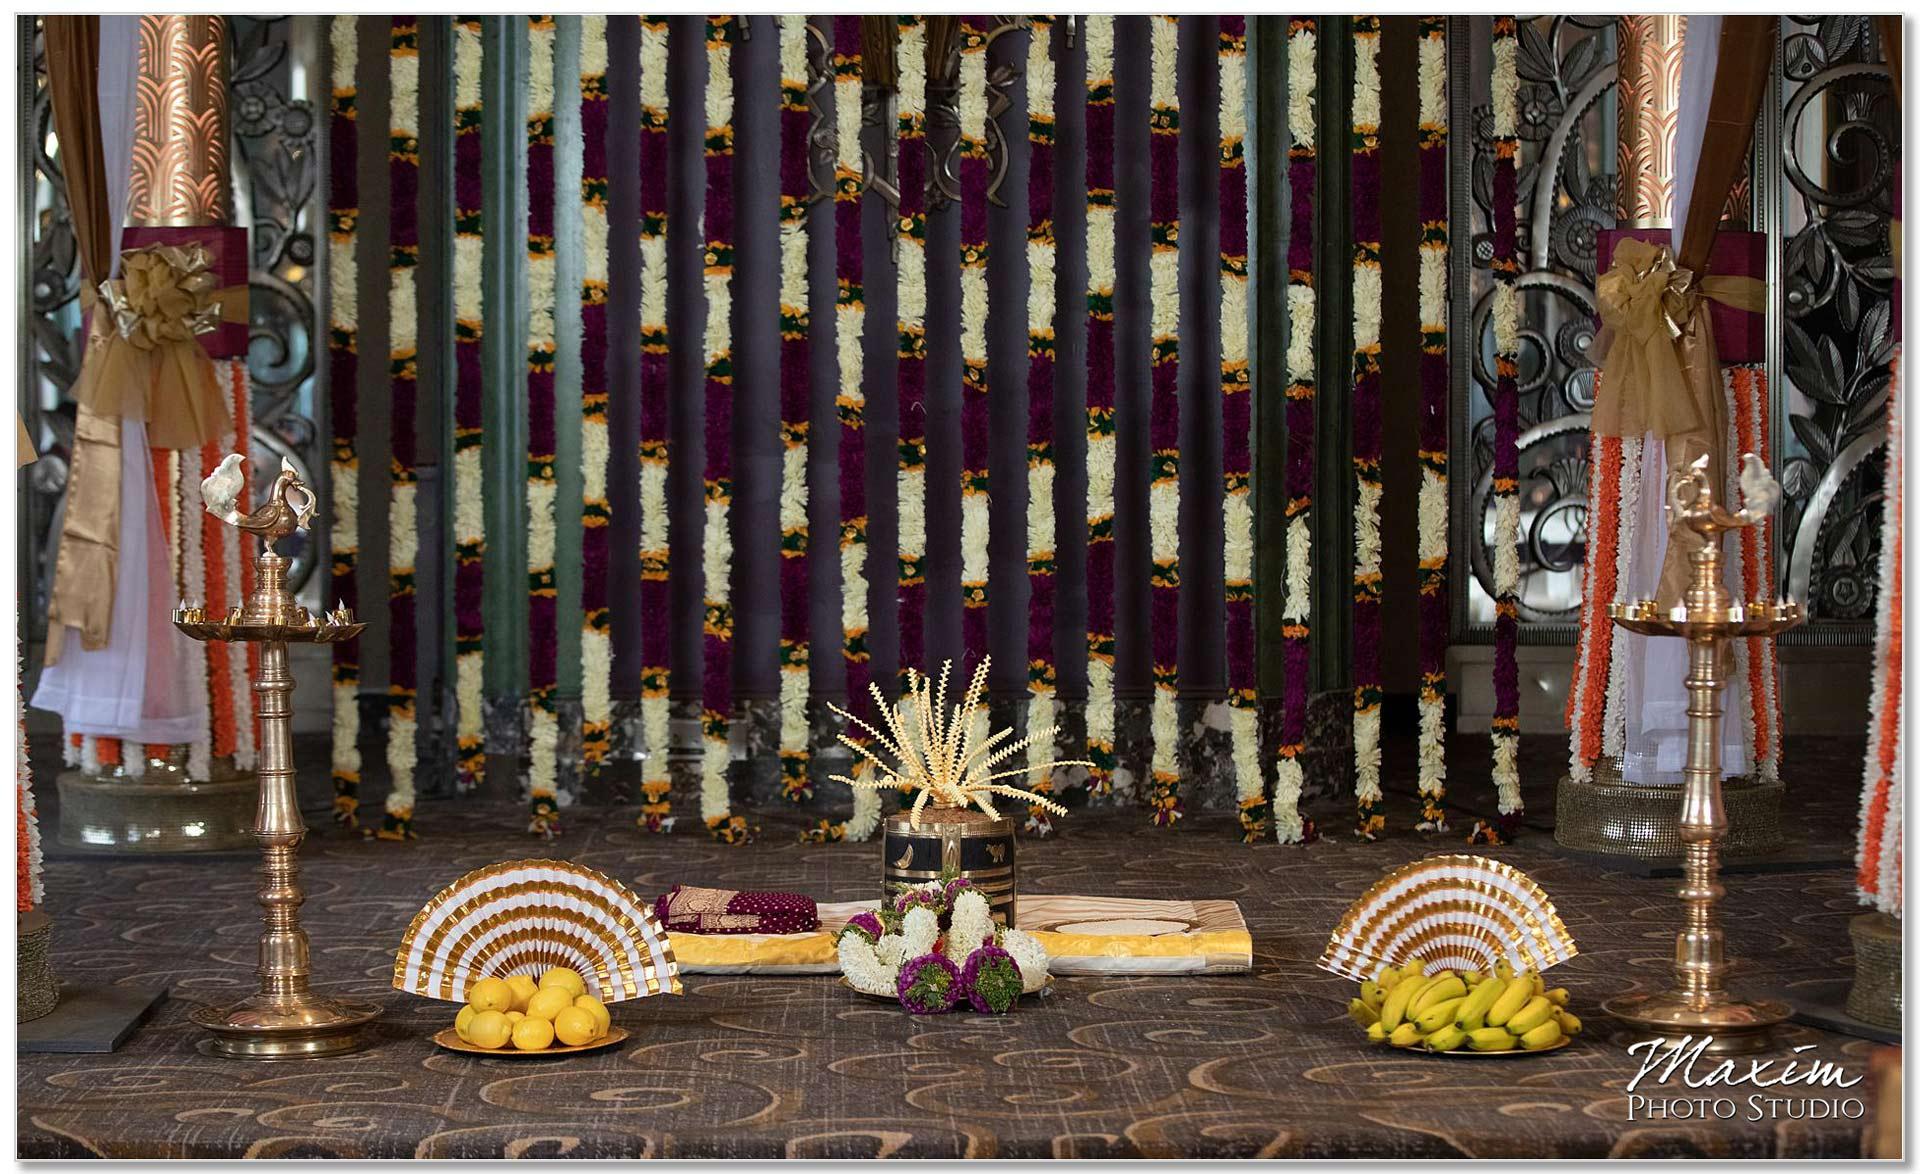 Continental Room Hilton Netherland Plaza Indian Wedding